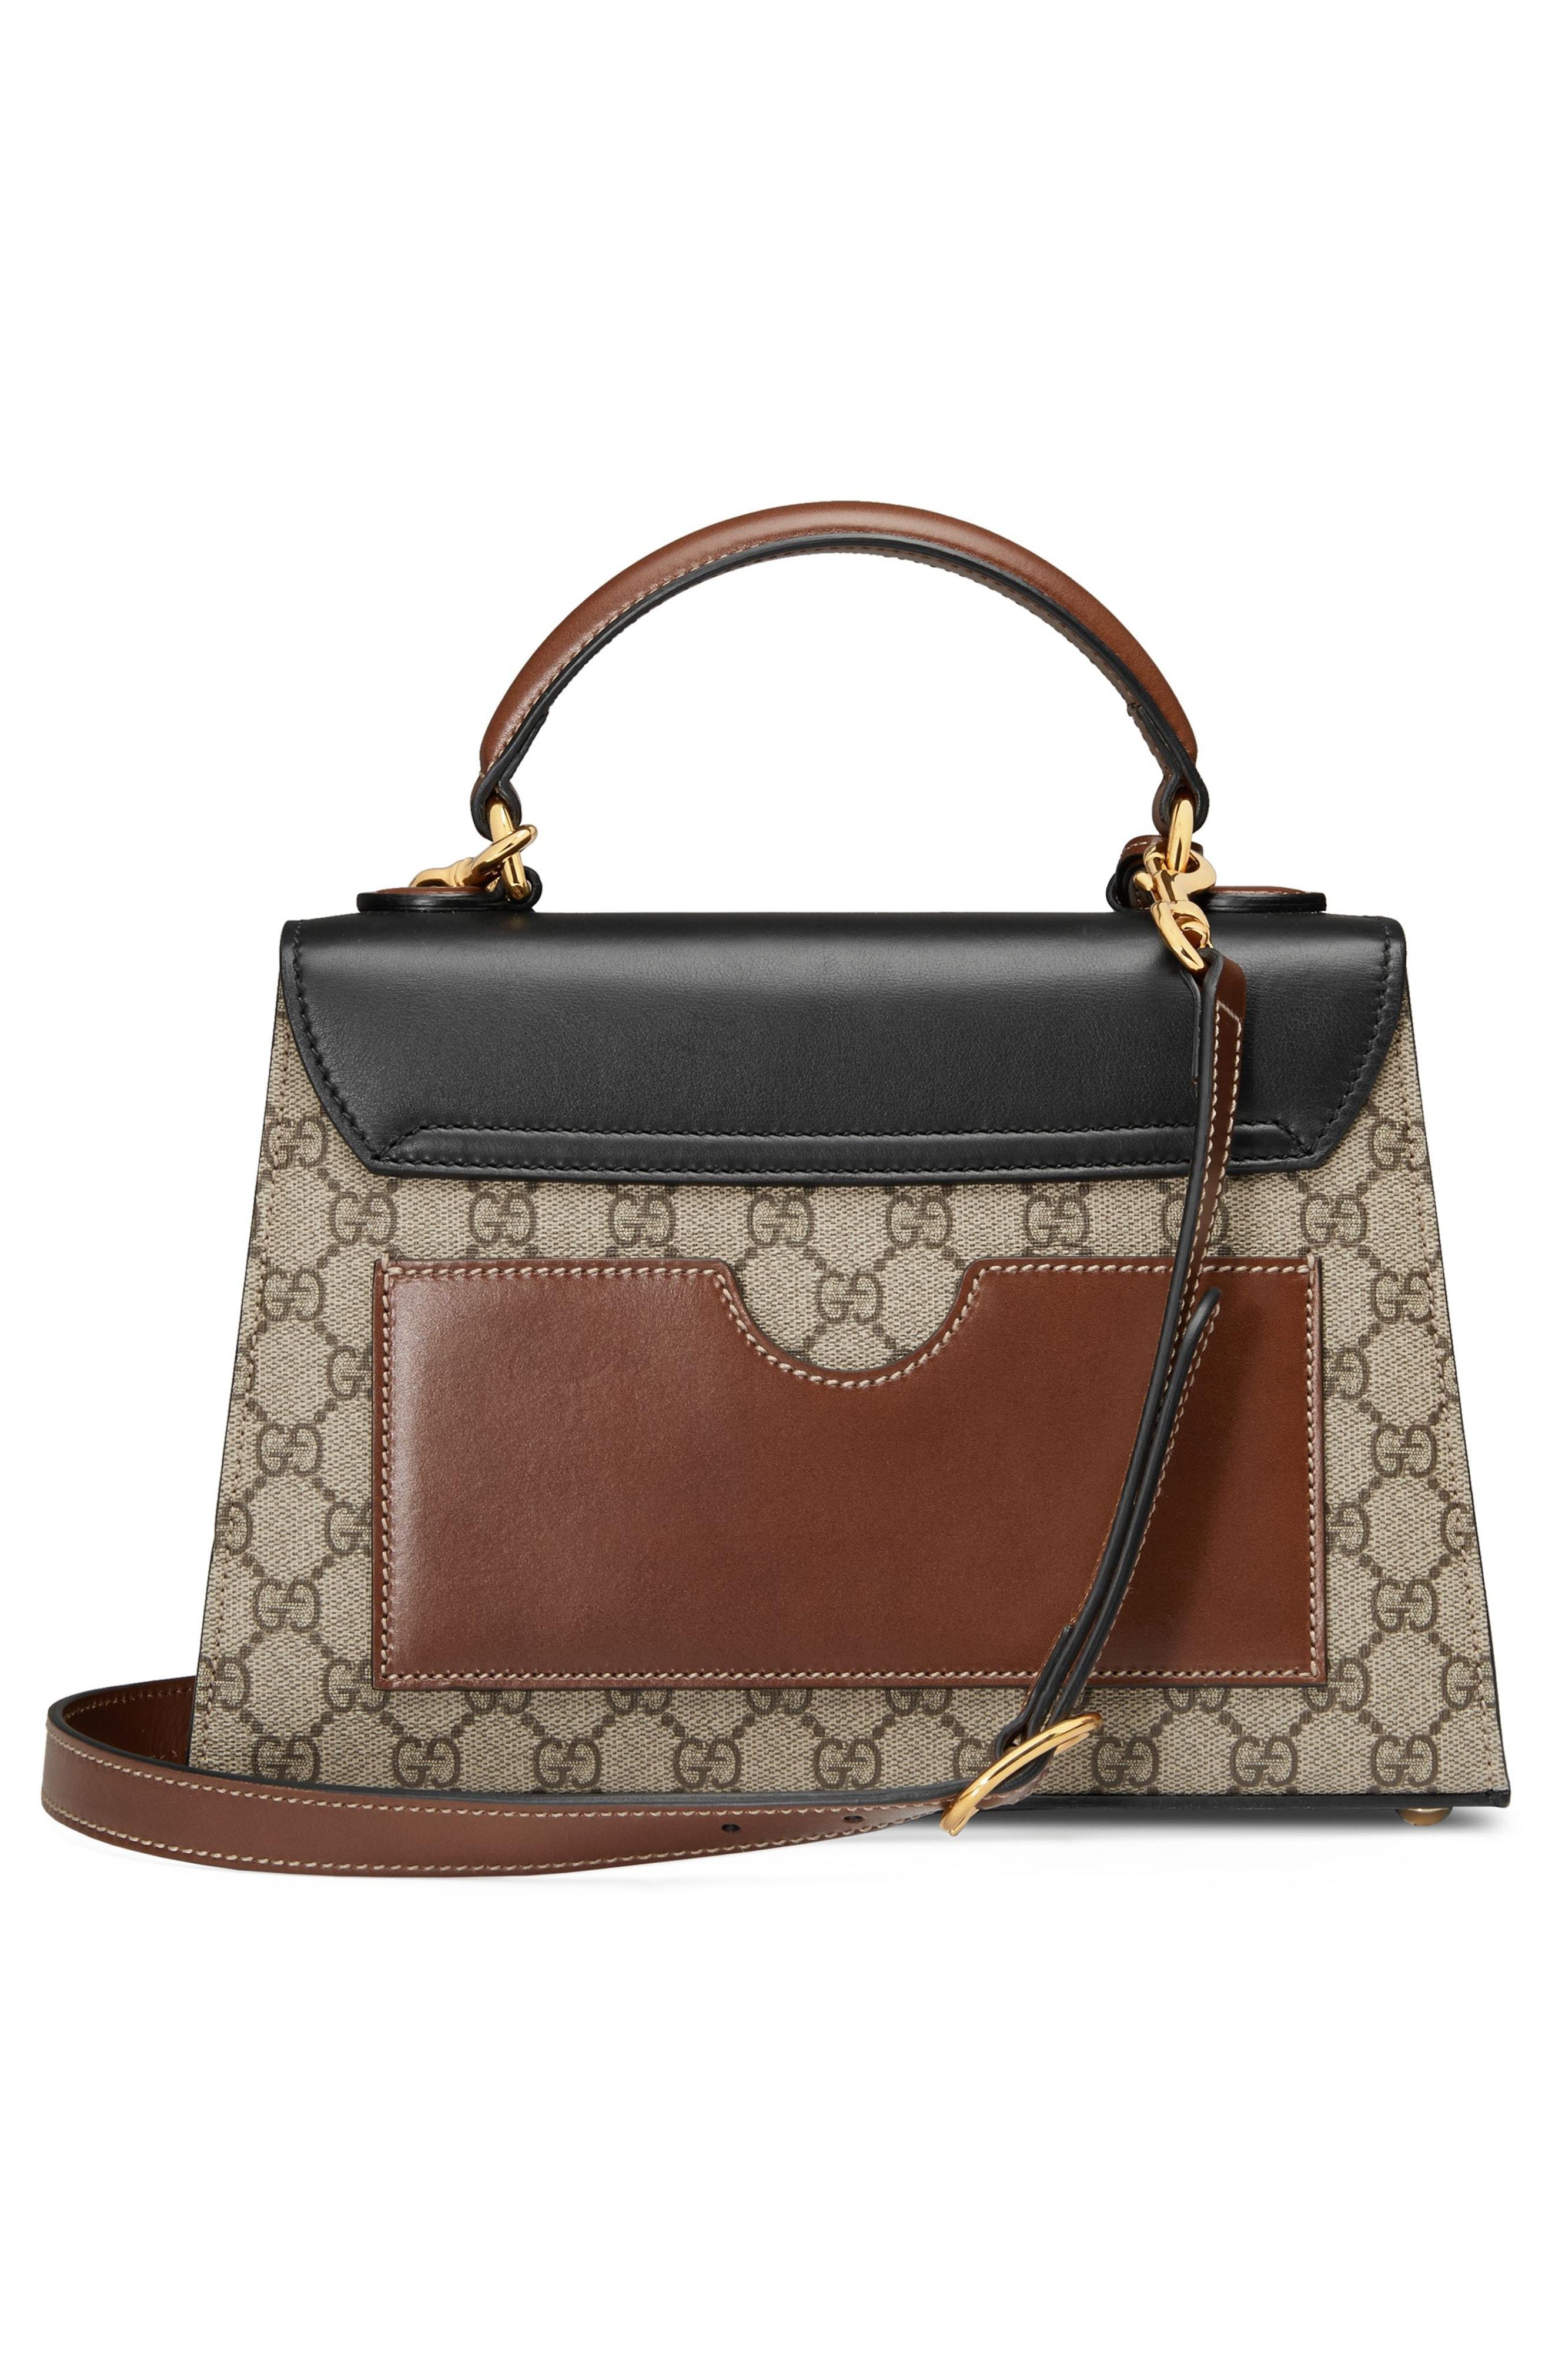 c2c2e1bfc124 Gucci Small Padlock Gg Supreme Canvas   Leather Top Handle Satchel ...